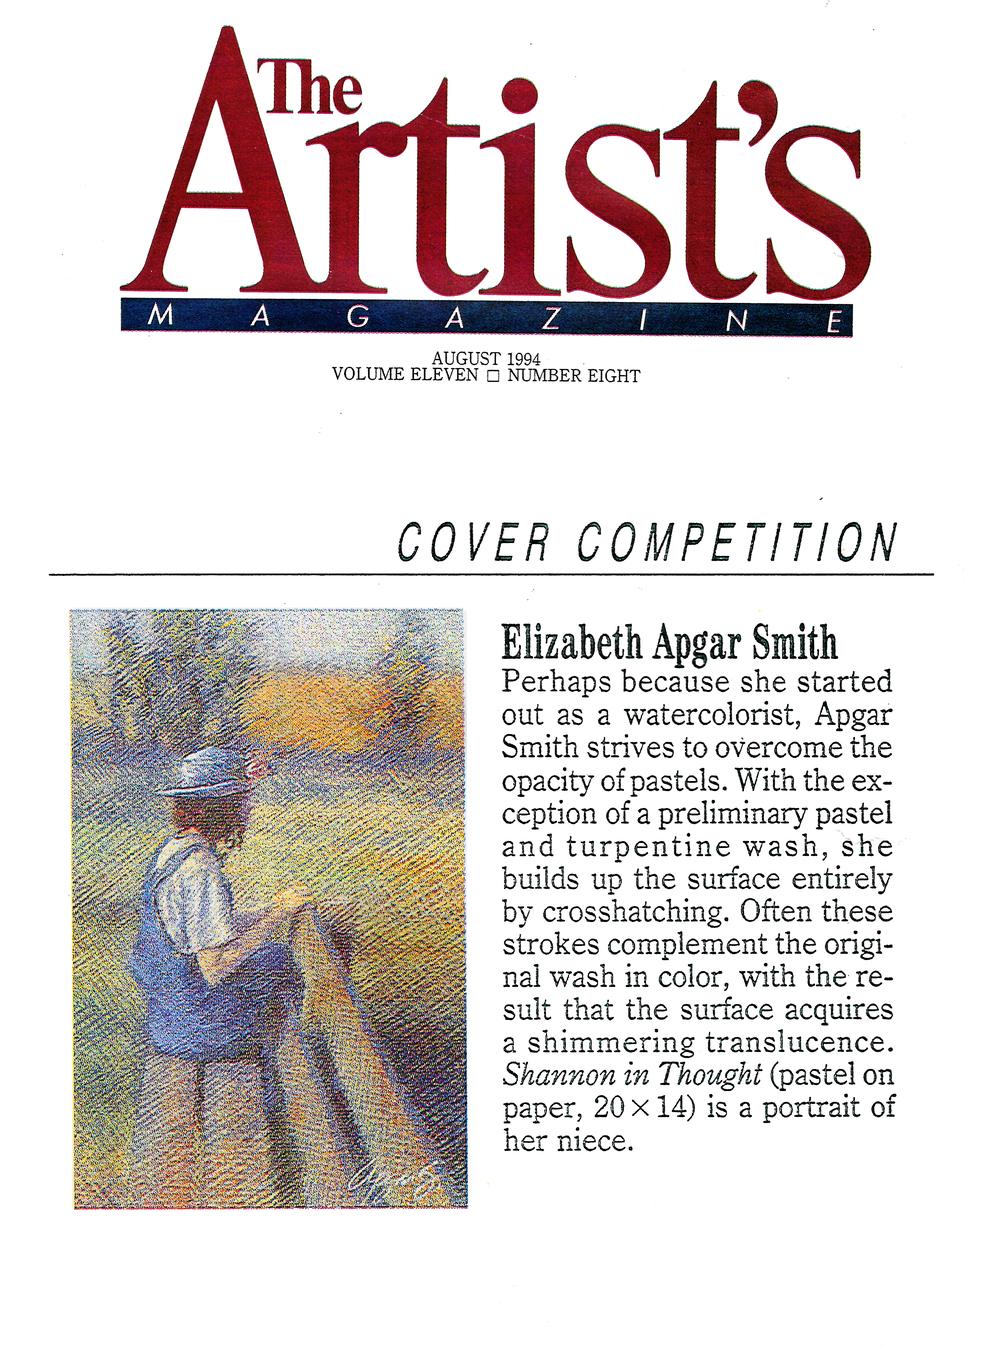 artists magazine cover competiiton.jpg